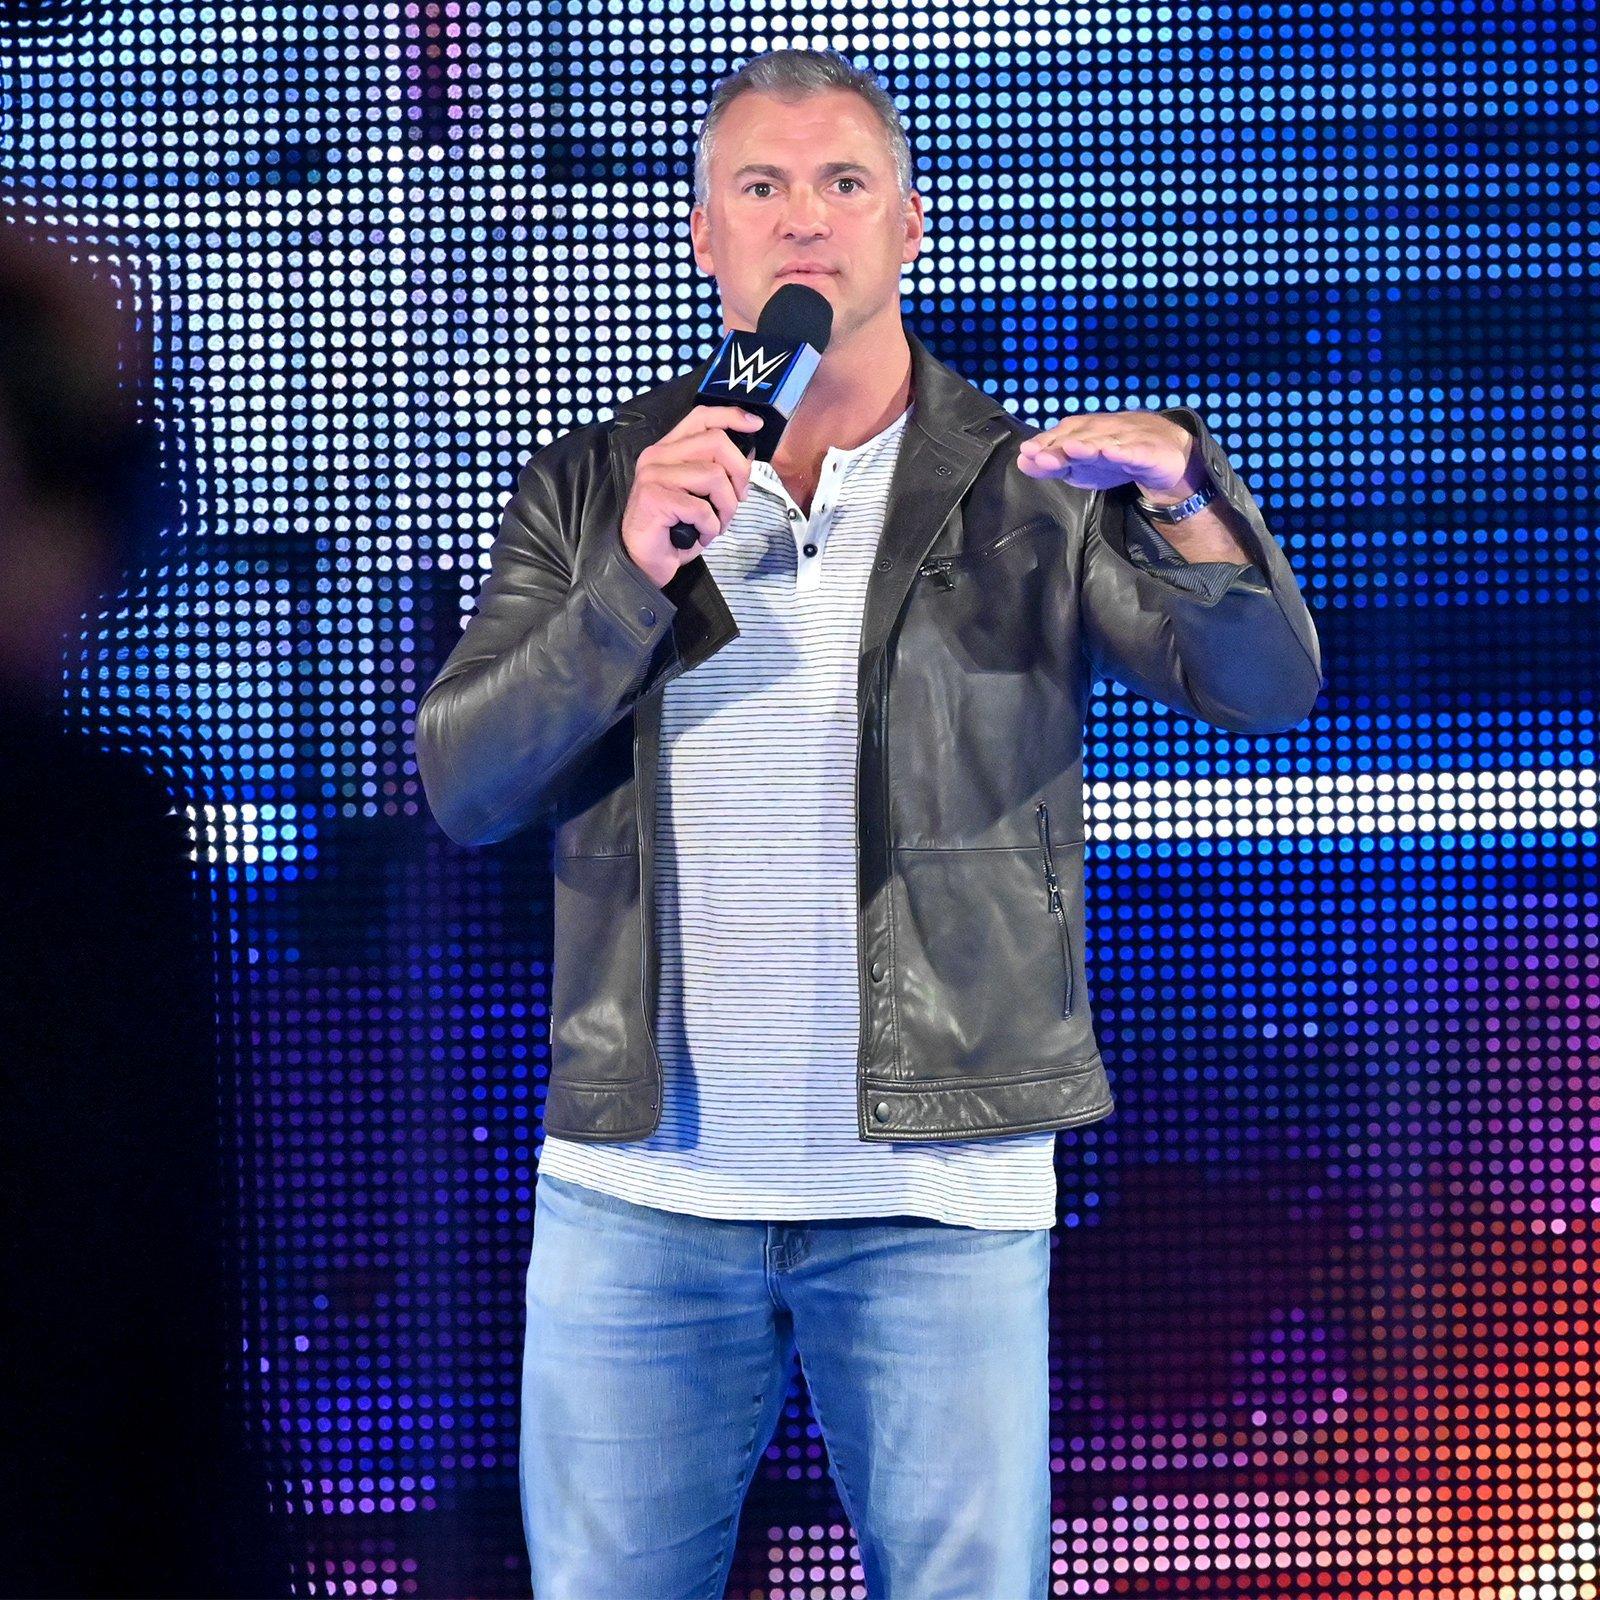 McMahon demands that Owens' microphone be cut.